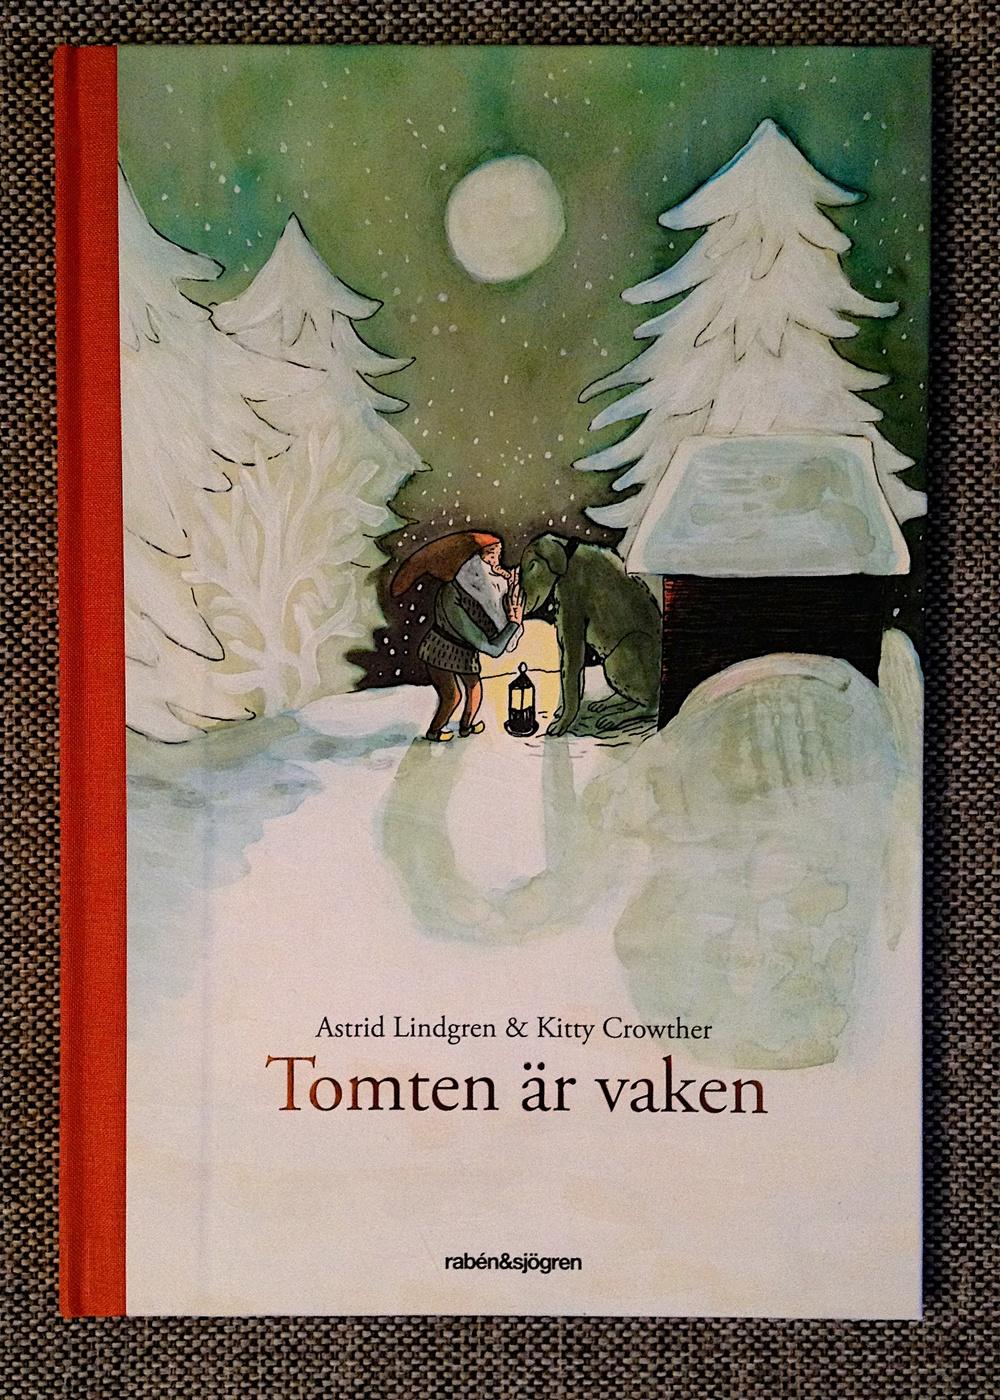 Tomten är vaken av Astrid Lindgren  Illustrationer av Kitty Crowther